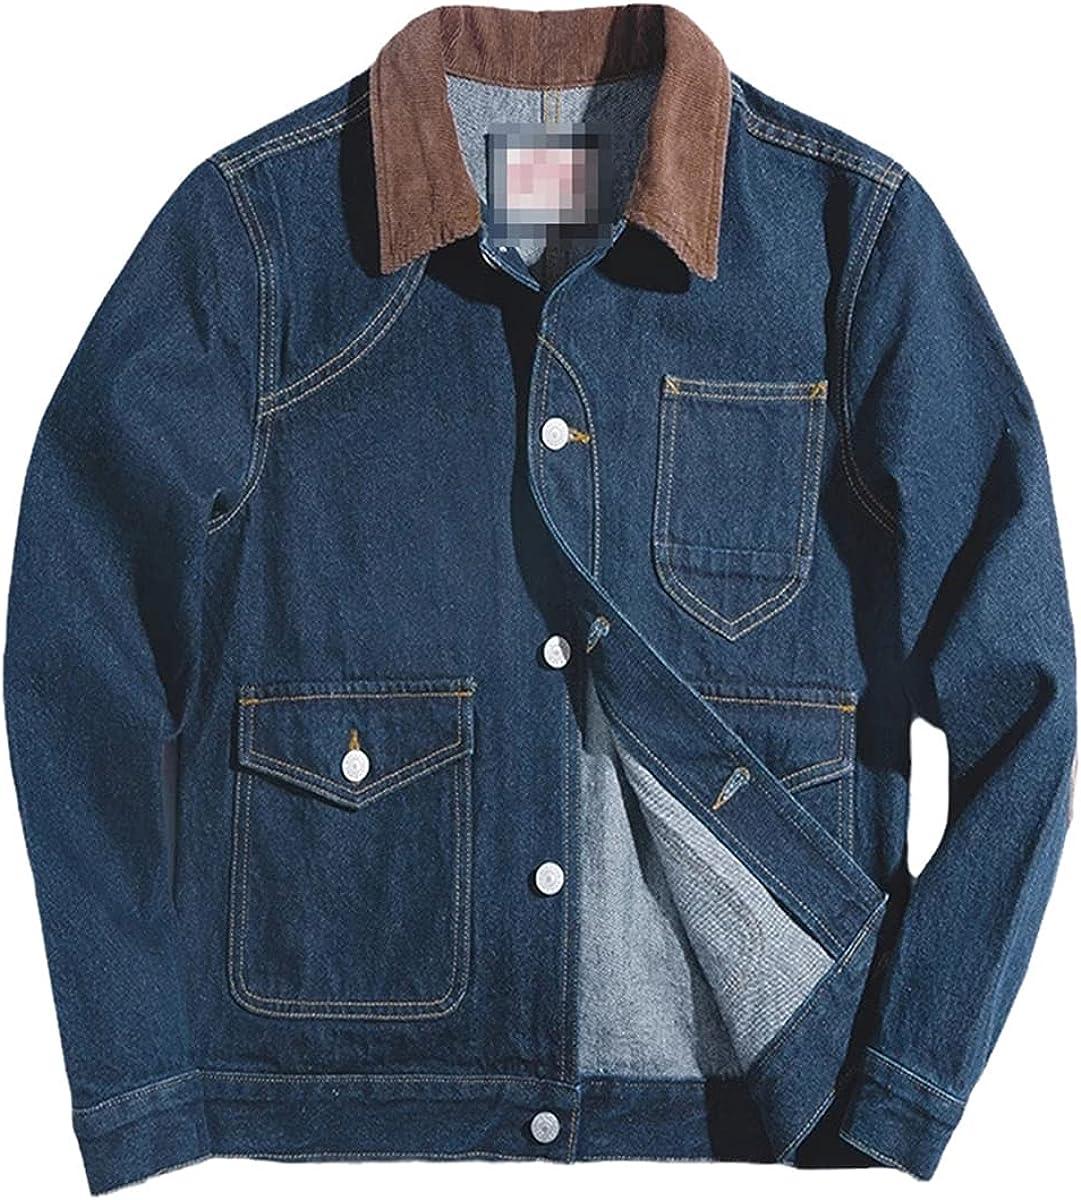 Men's Loose Denim Jacket Casual Retro Blue Coat Peach Color Corduroy Cotton Pocket Hunting Jacket Men's